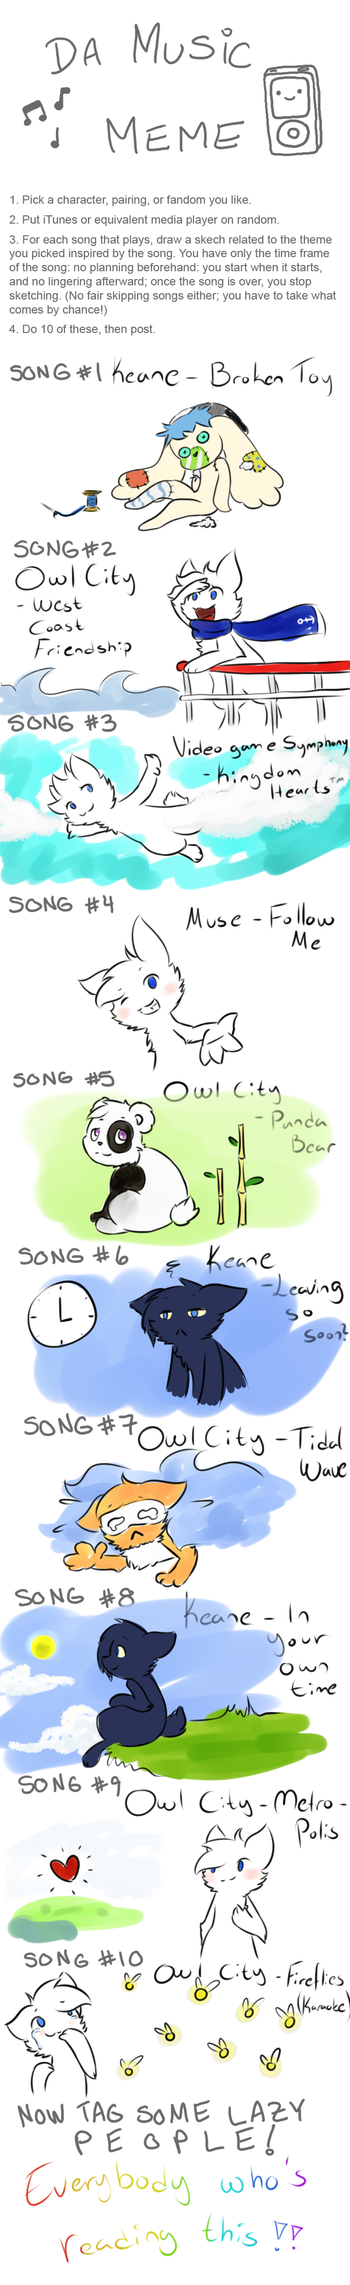 Music meme - Scoli version! by Heise-kun